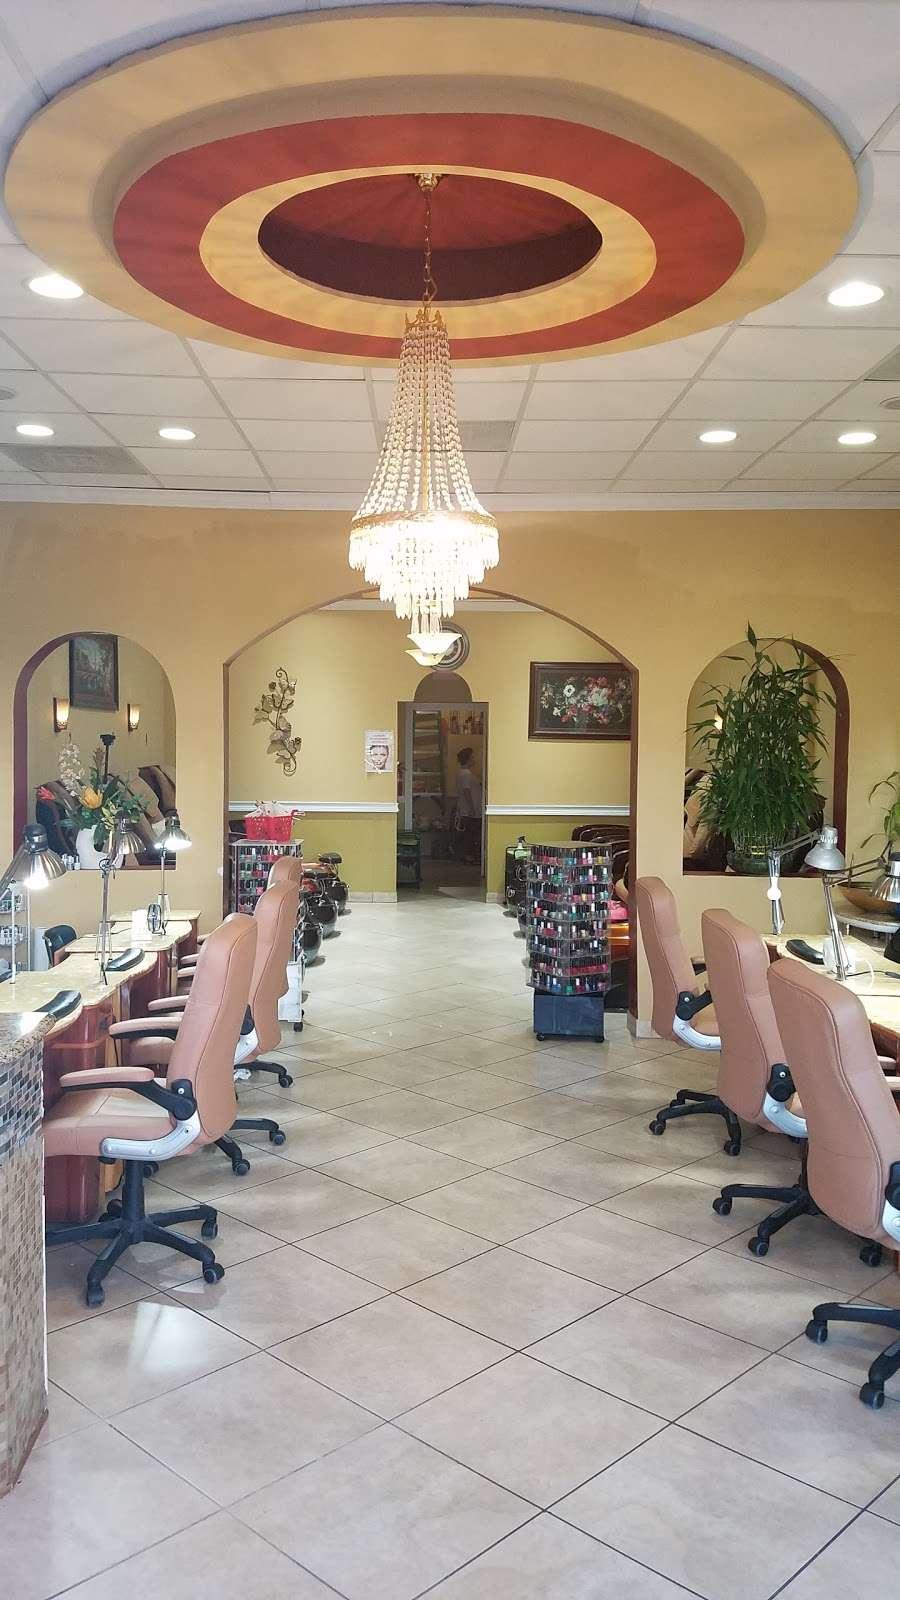 Golden Nails & Spa - spa  | Photo 2 of 10 | Address: 8245 Mills Rd, Houston, TX 77064, USA | Phone: (832) 688-5884